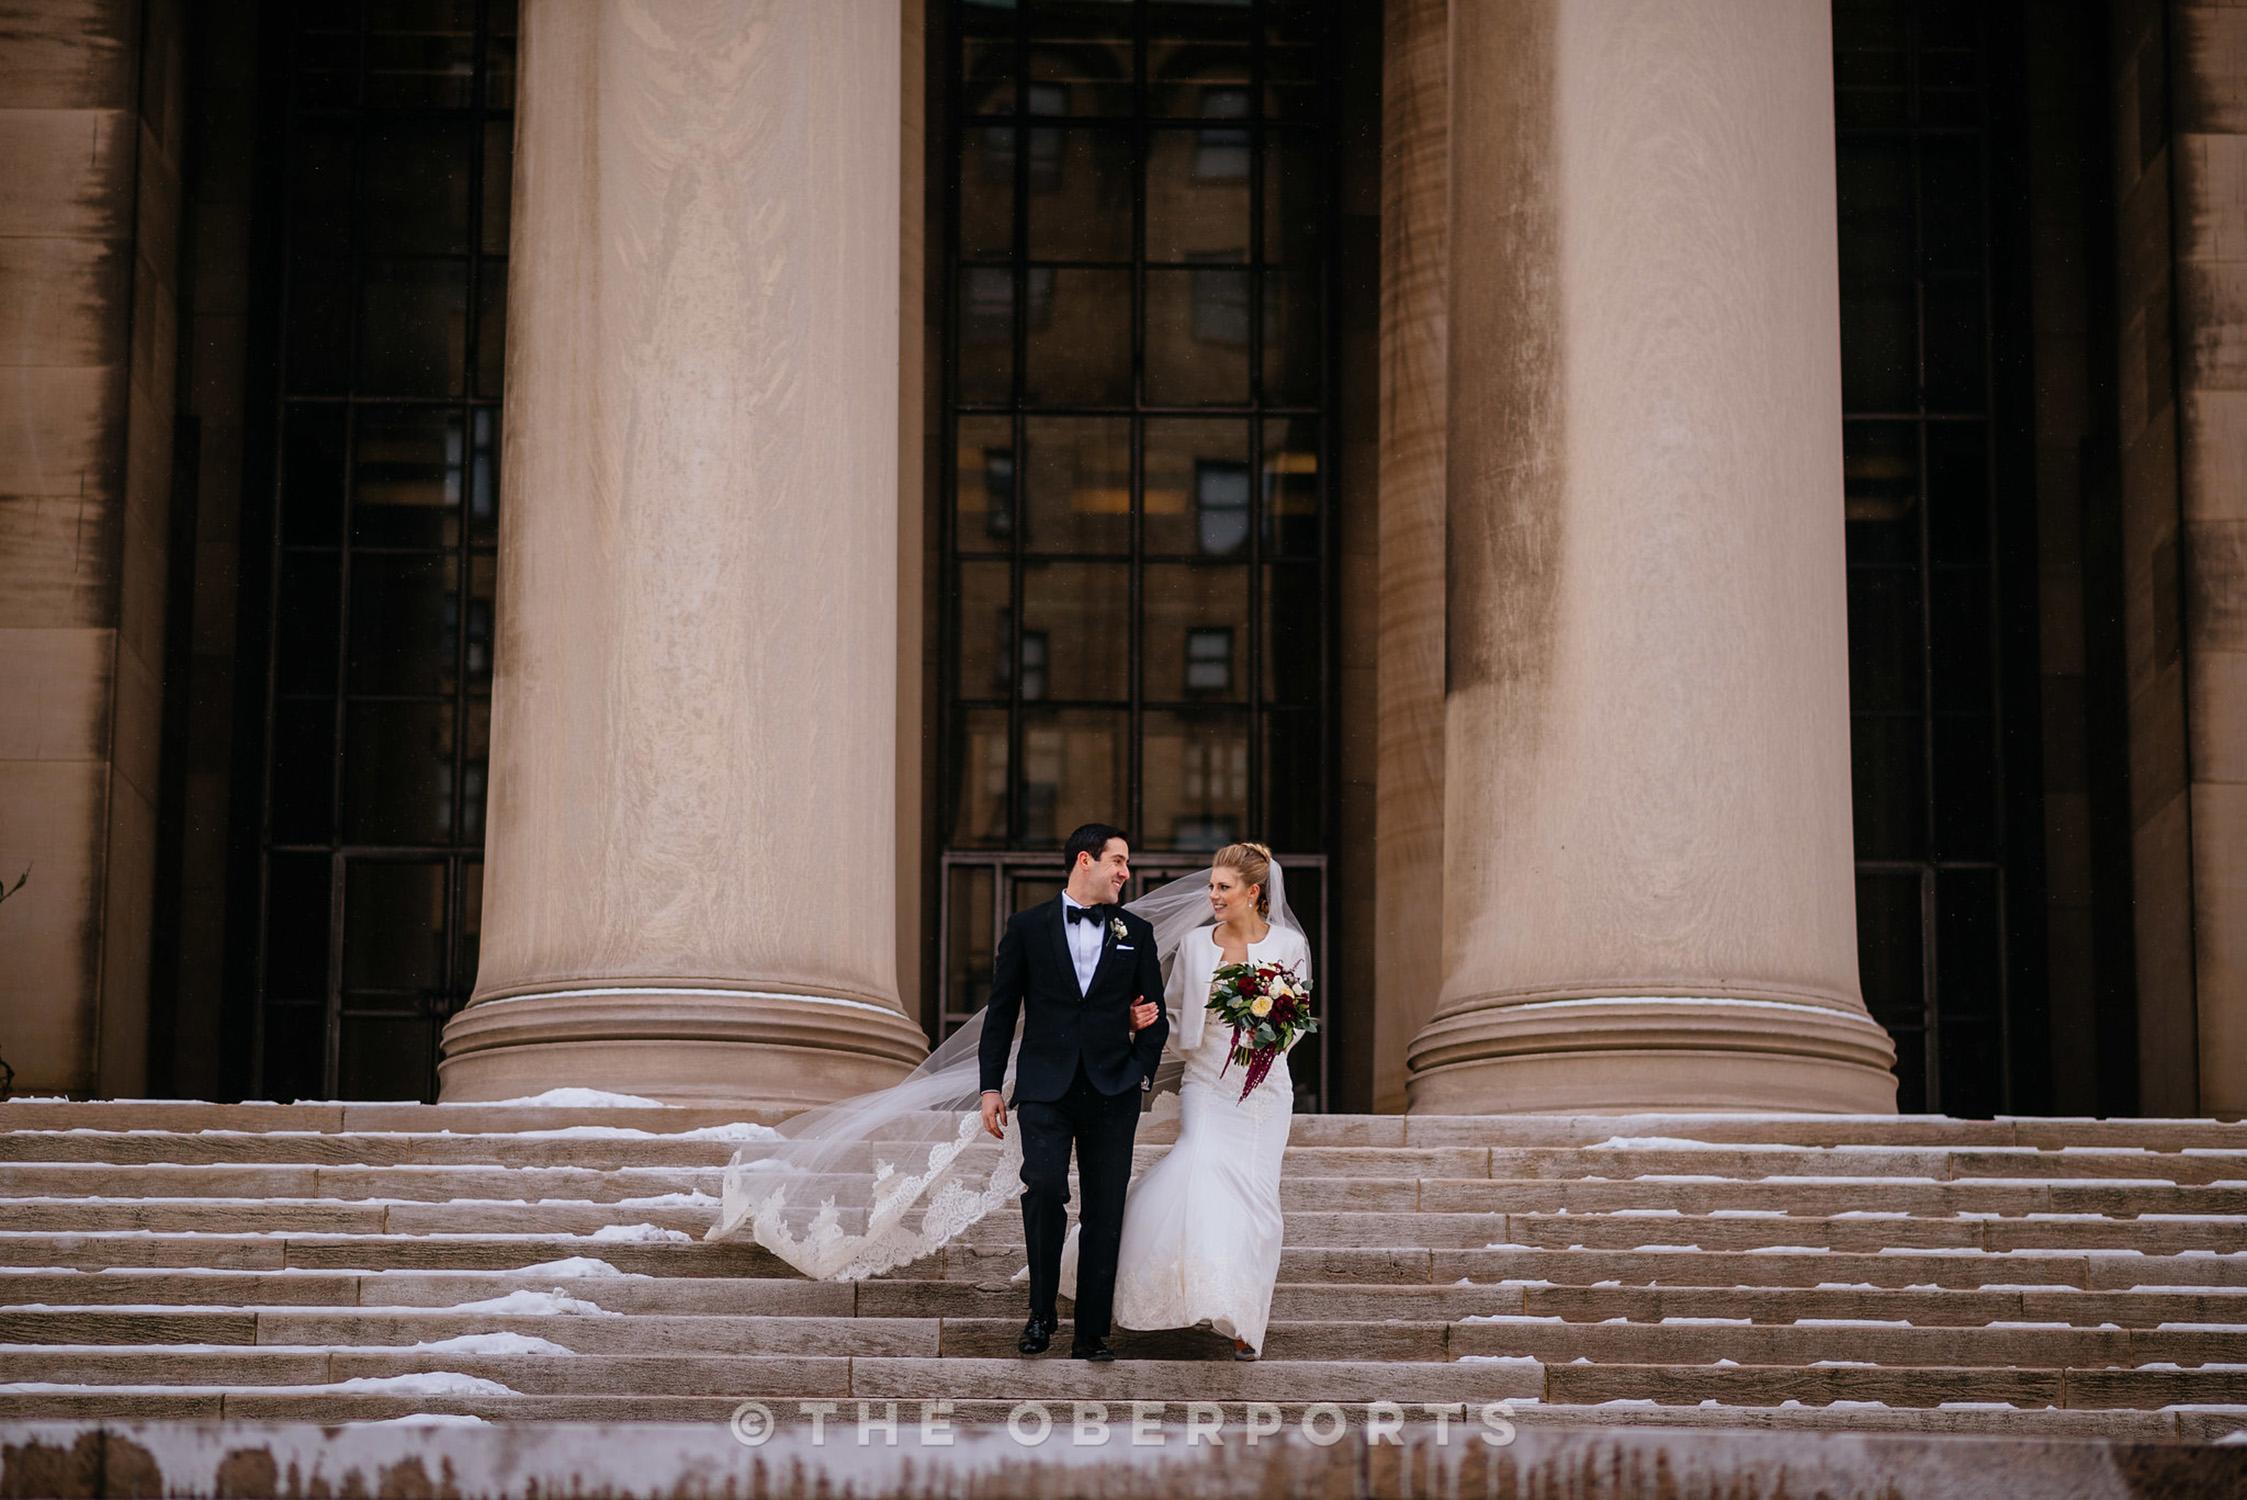 418-joaniechris-wedding.jpg